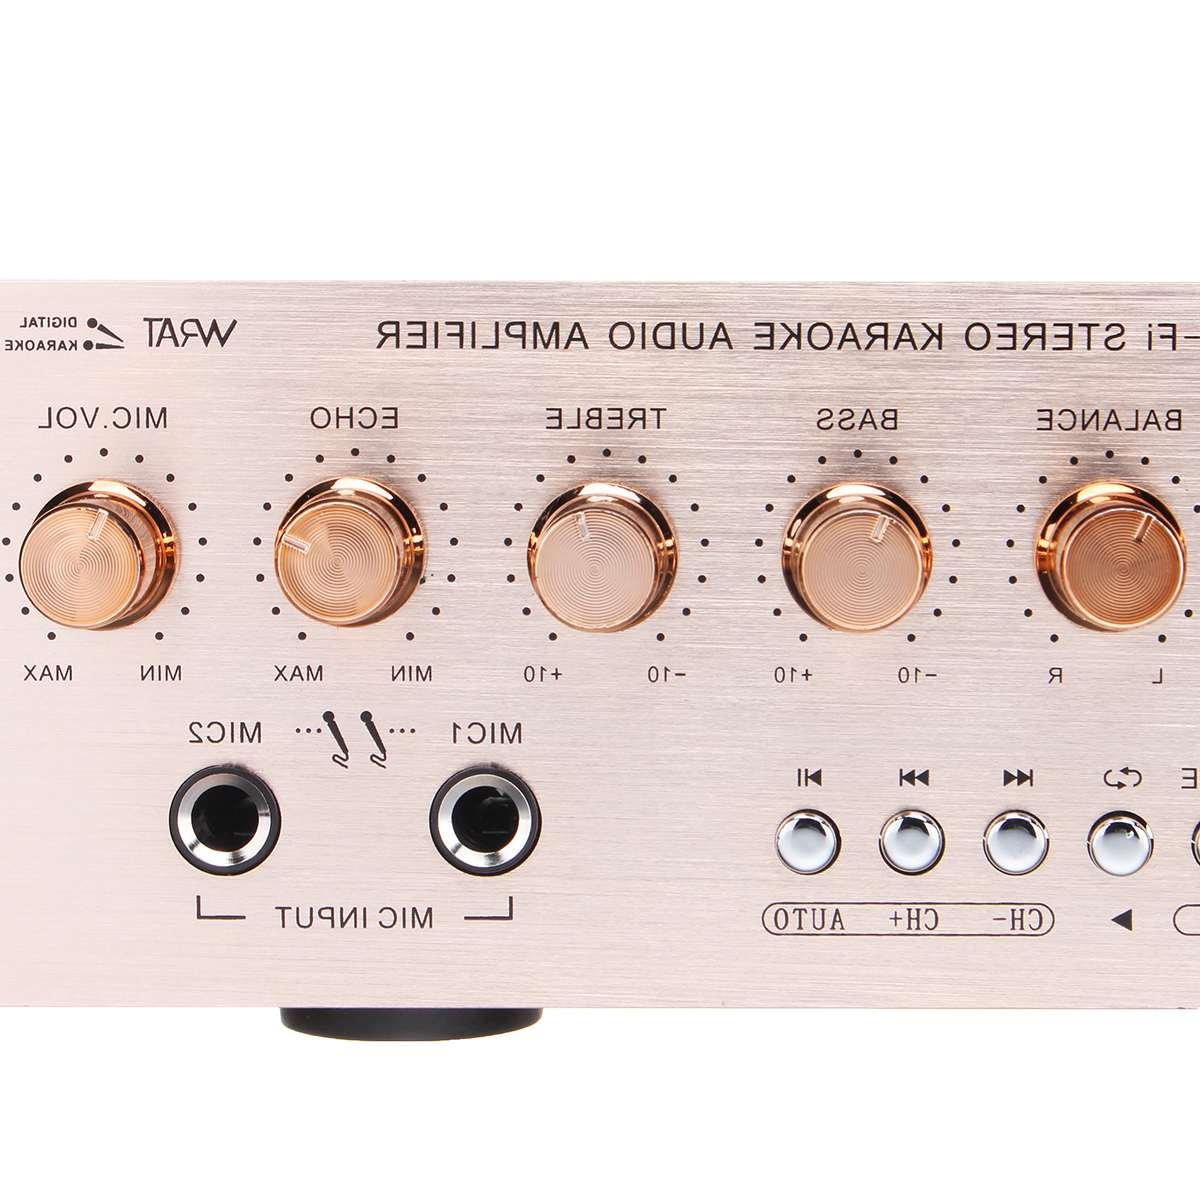 920W 220V HiFi <font><b>Stereo</b></font> <font><b>Amplifier</b></font> <font><b>Home</b></font> <font><b>Amplifiers</b></font>